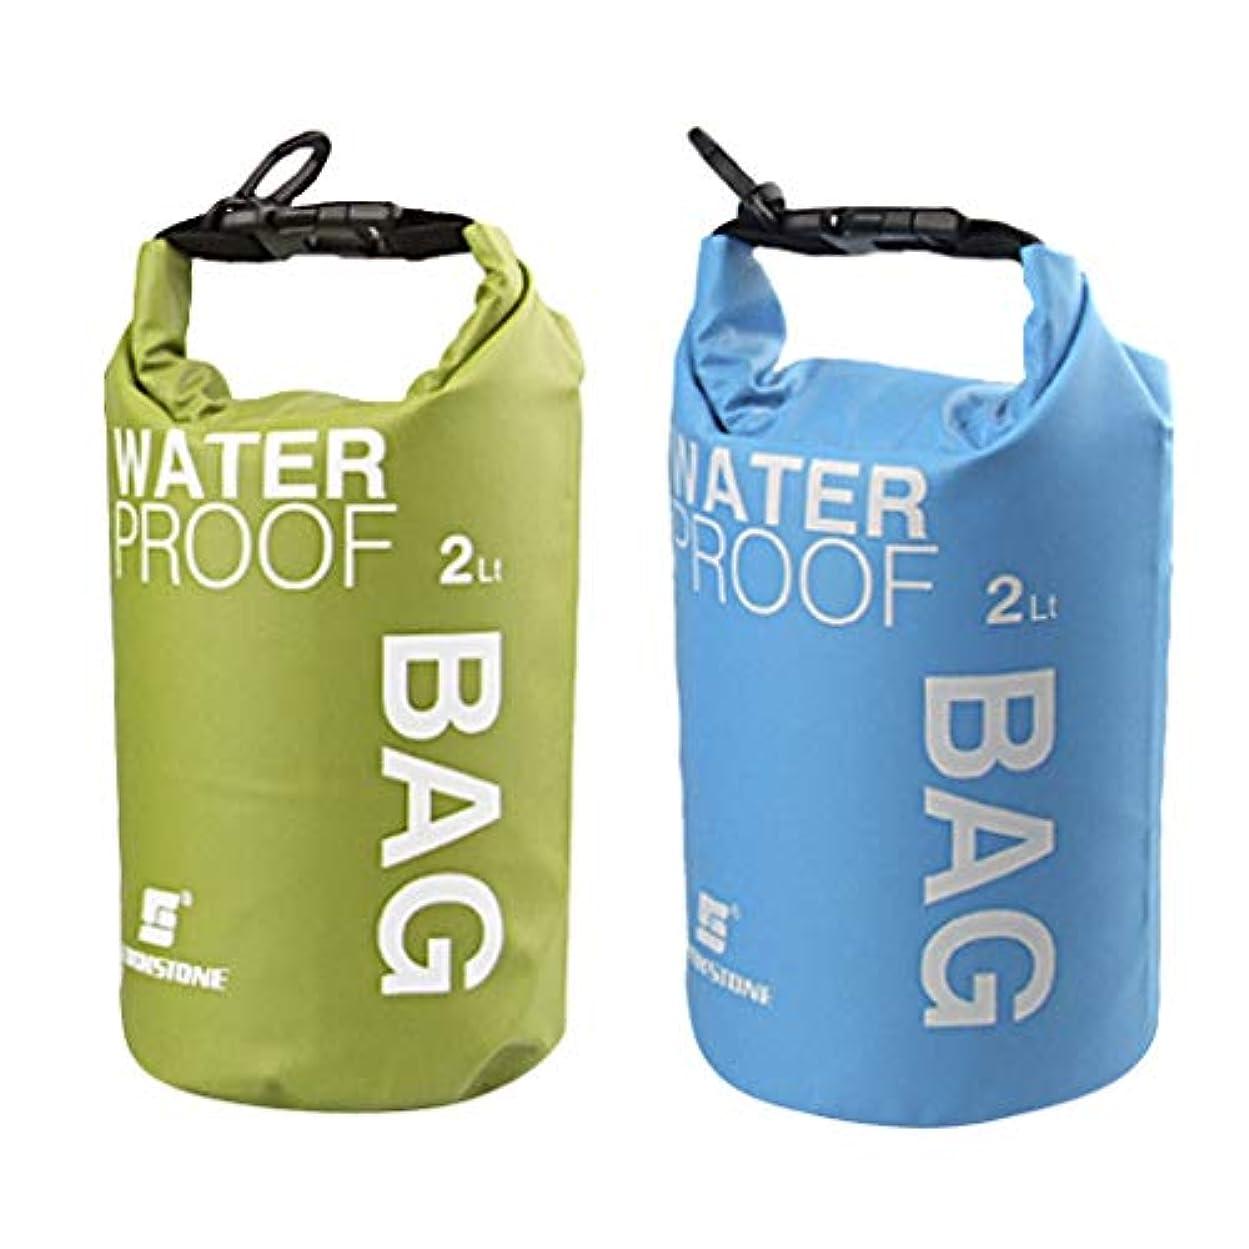 B Baosity 2本 防水ドライバッグ袋 ポーチ カヤック キャンプ ラフティング フローティング 2L